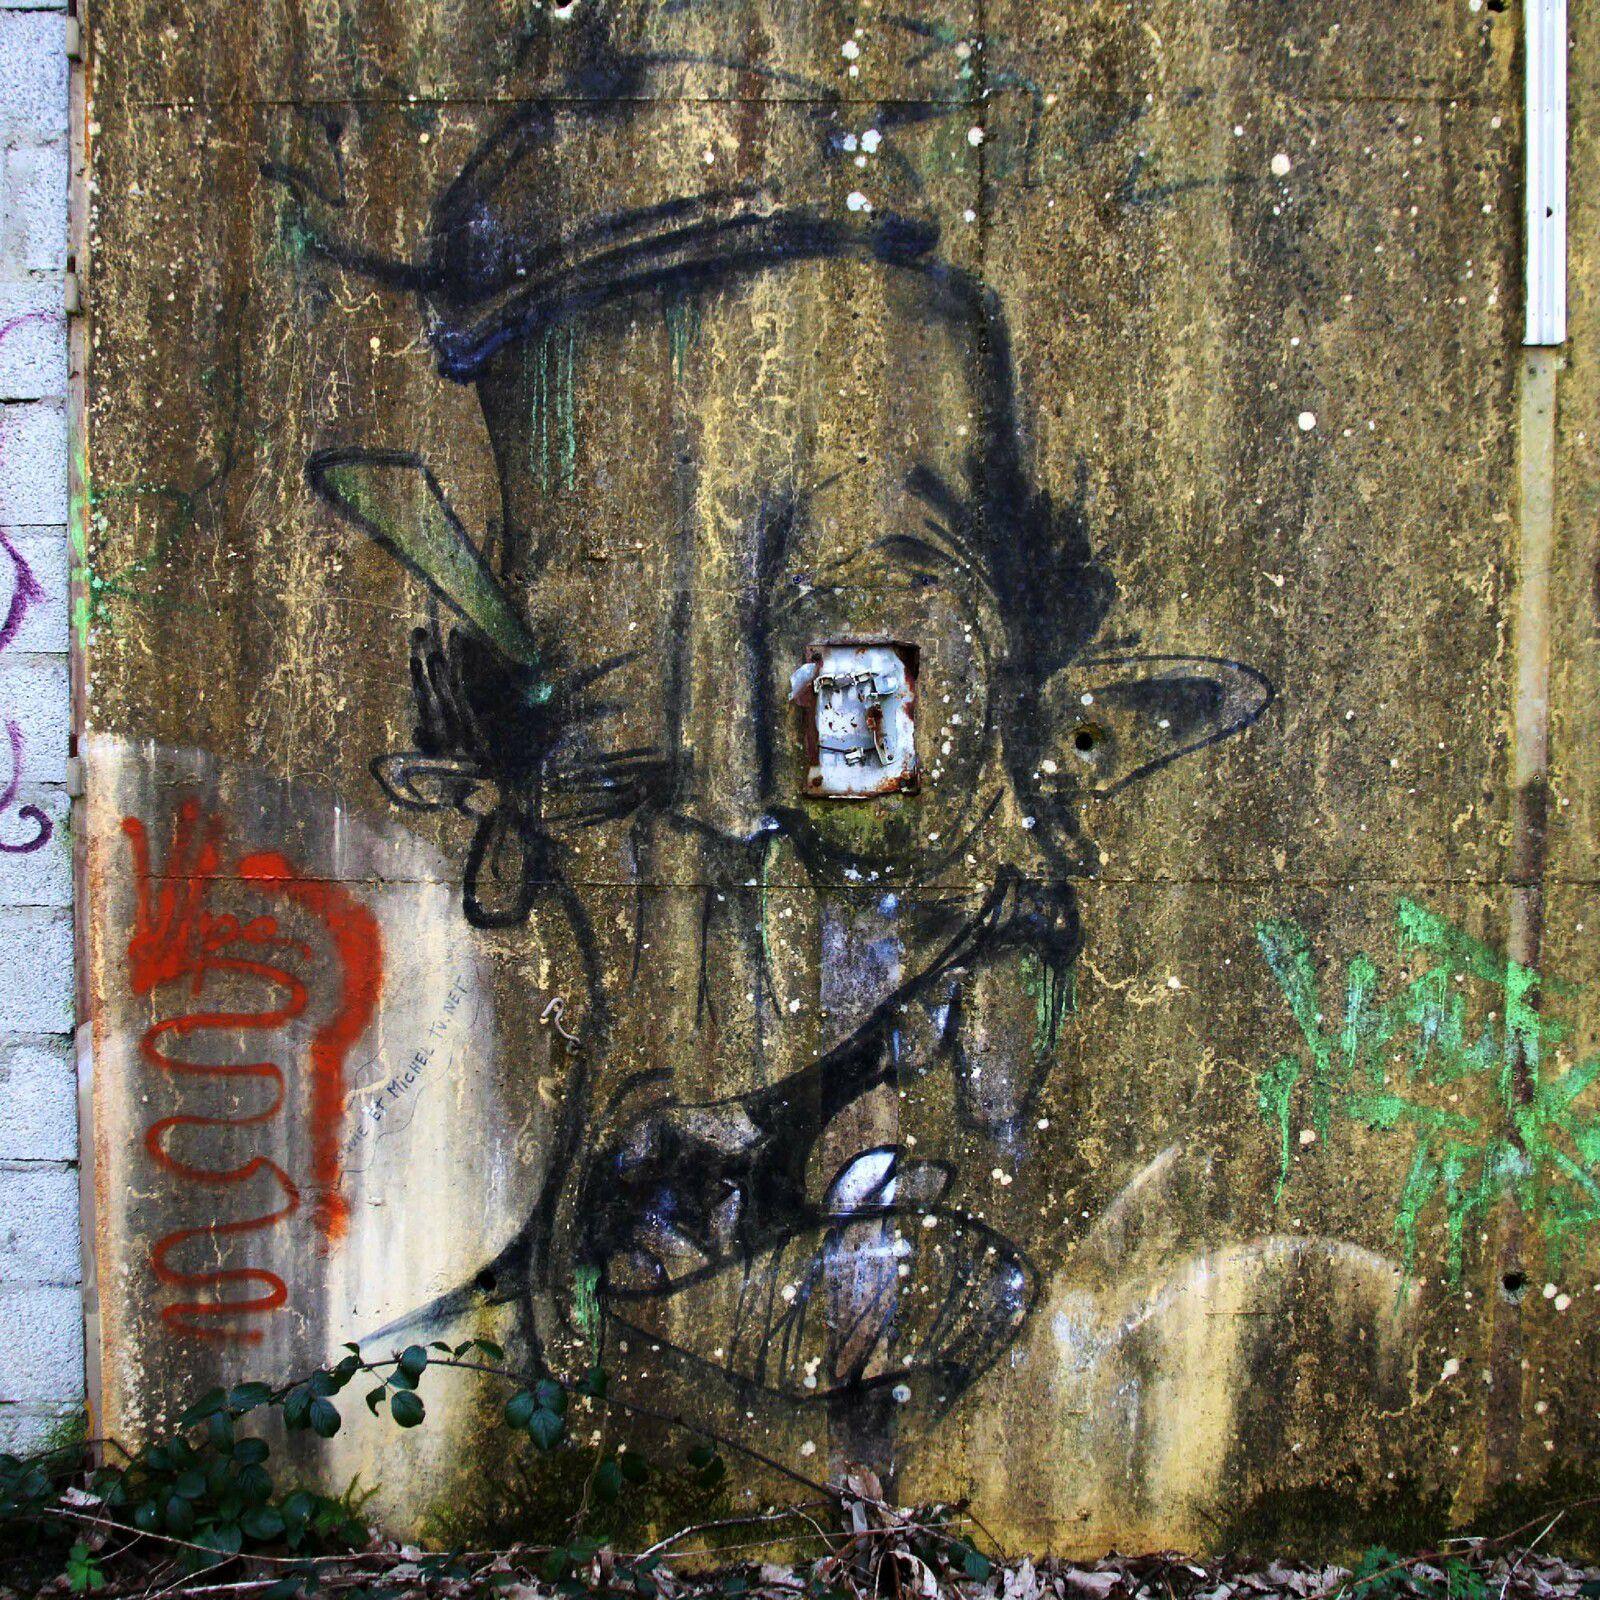 Graffiti à la Poudrière (2) - Mercredi 24 mars 2021